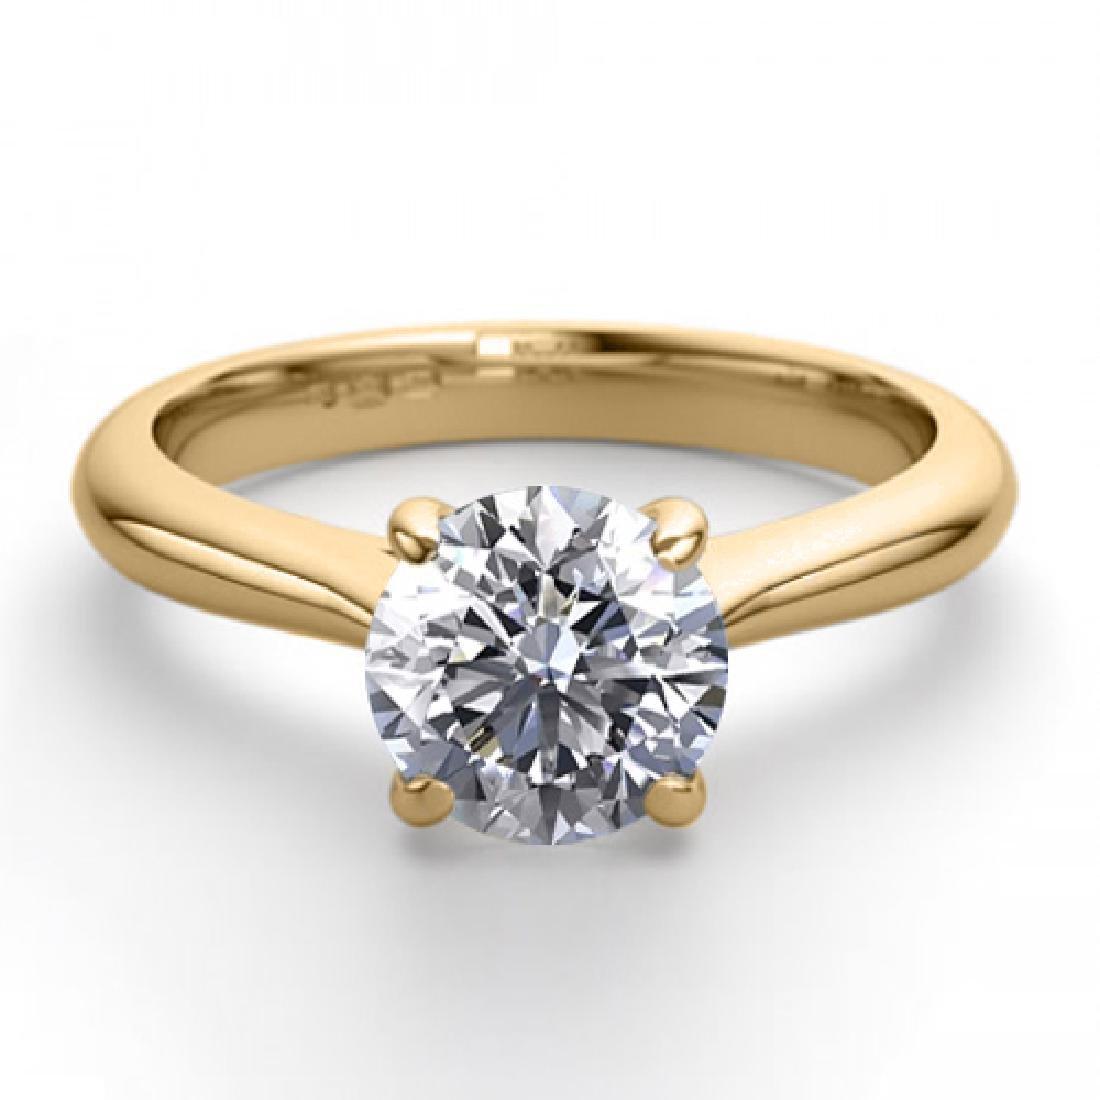 14K Yellow Gold Jewelry 1.41 ctw Natural Diamond